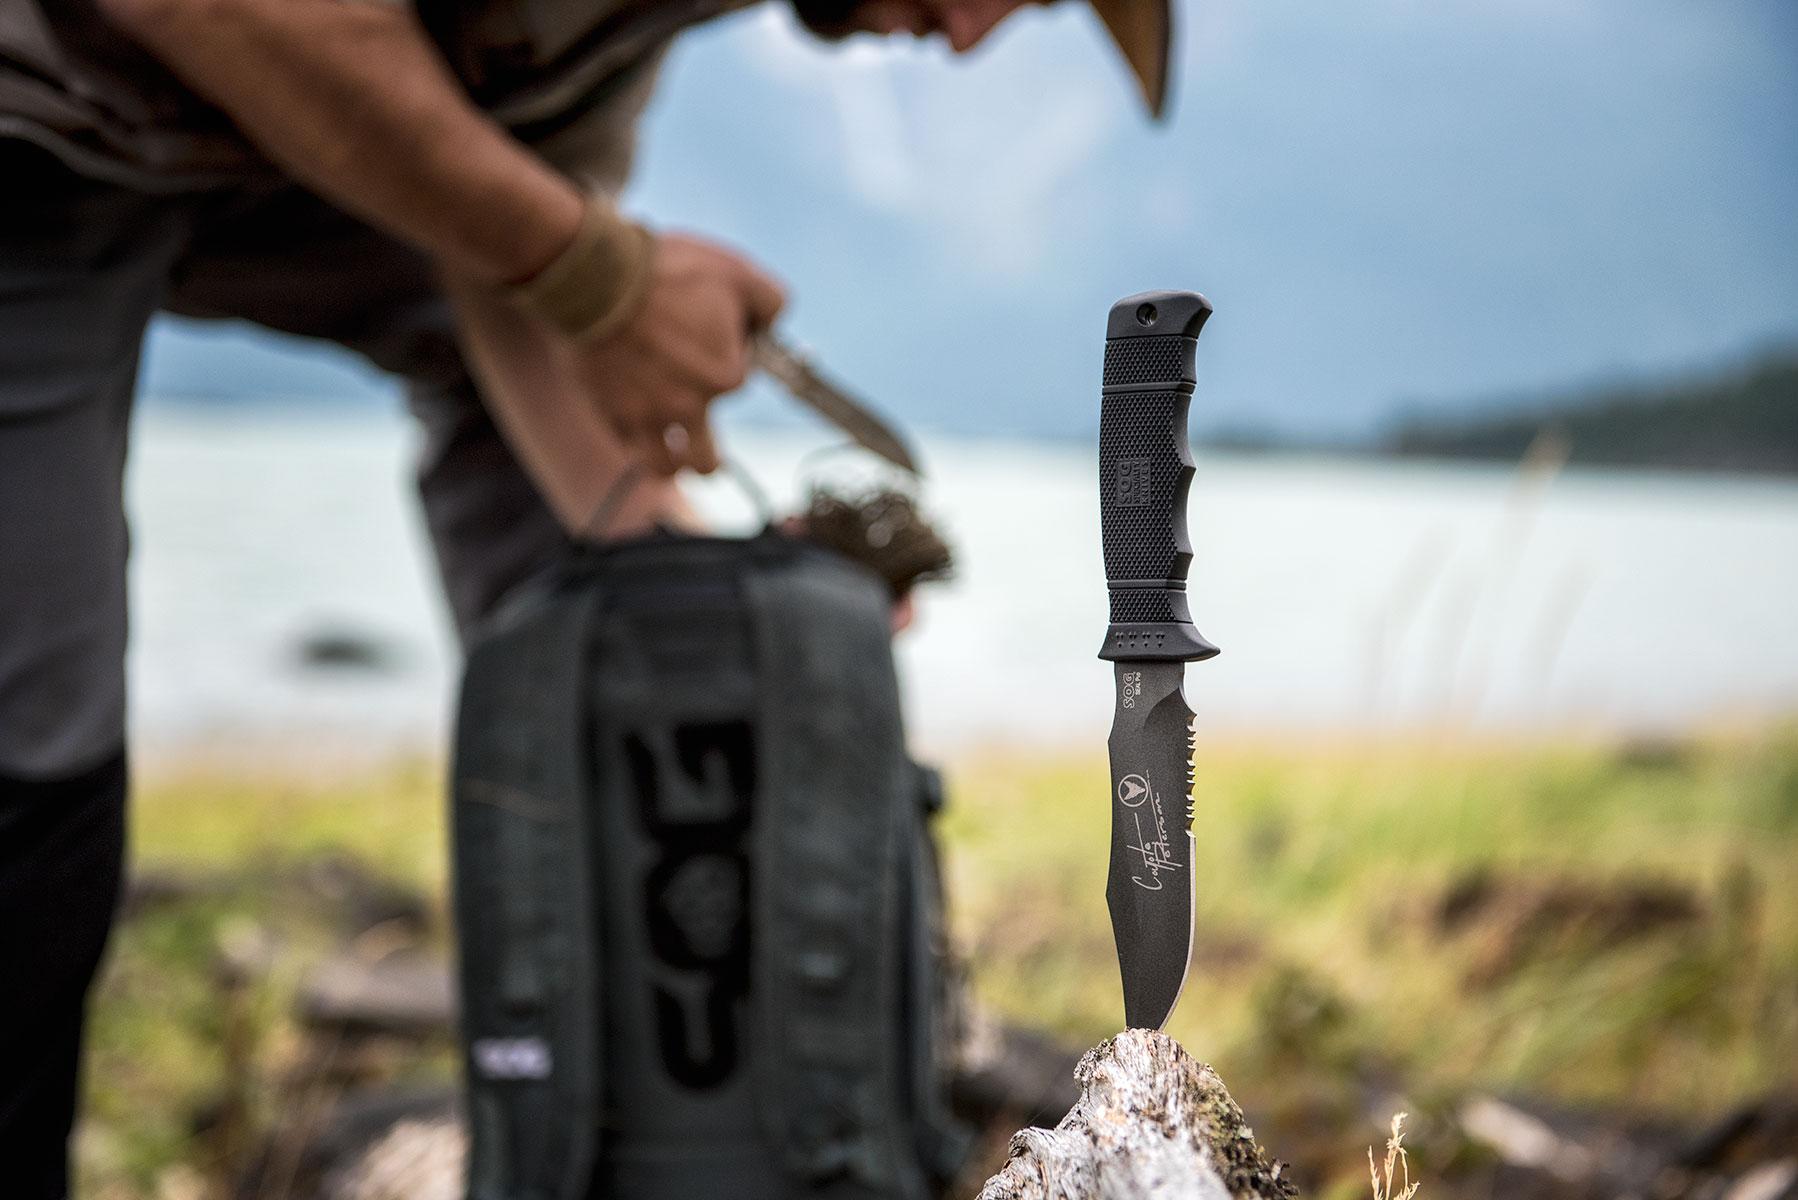 austin-trigg-brave-wilderness-alaska-BW-Sog-knife-products-log.jpg